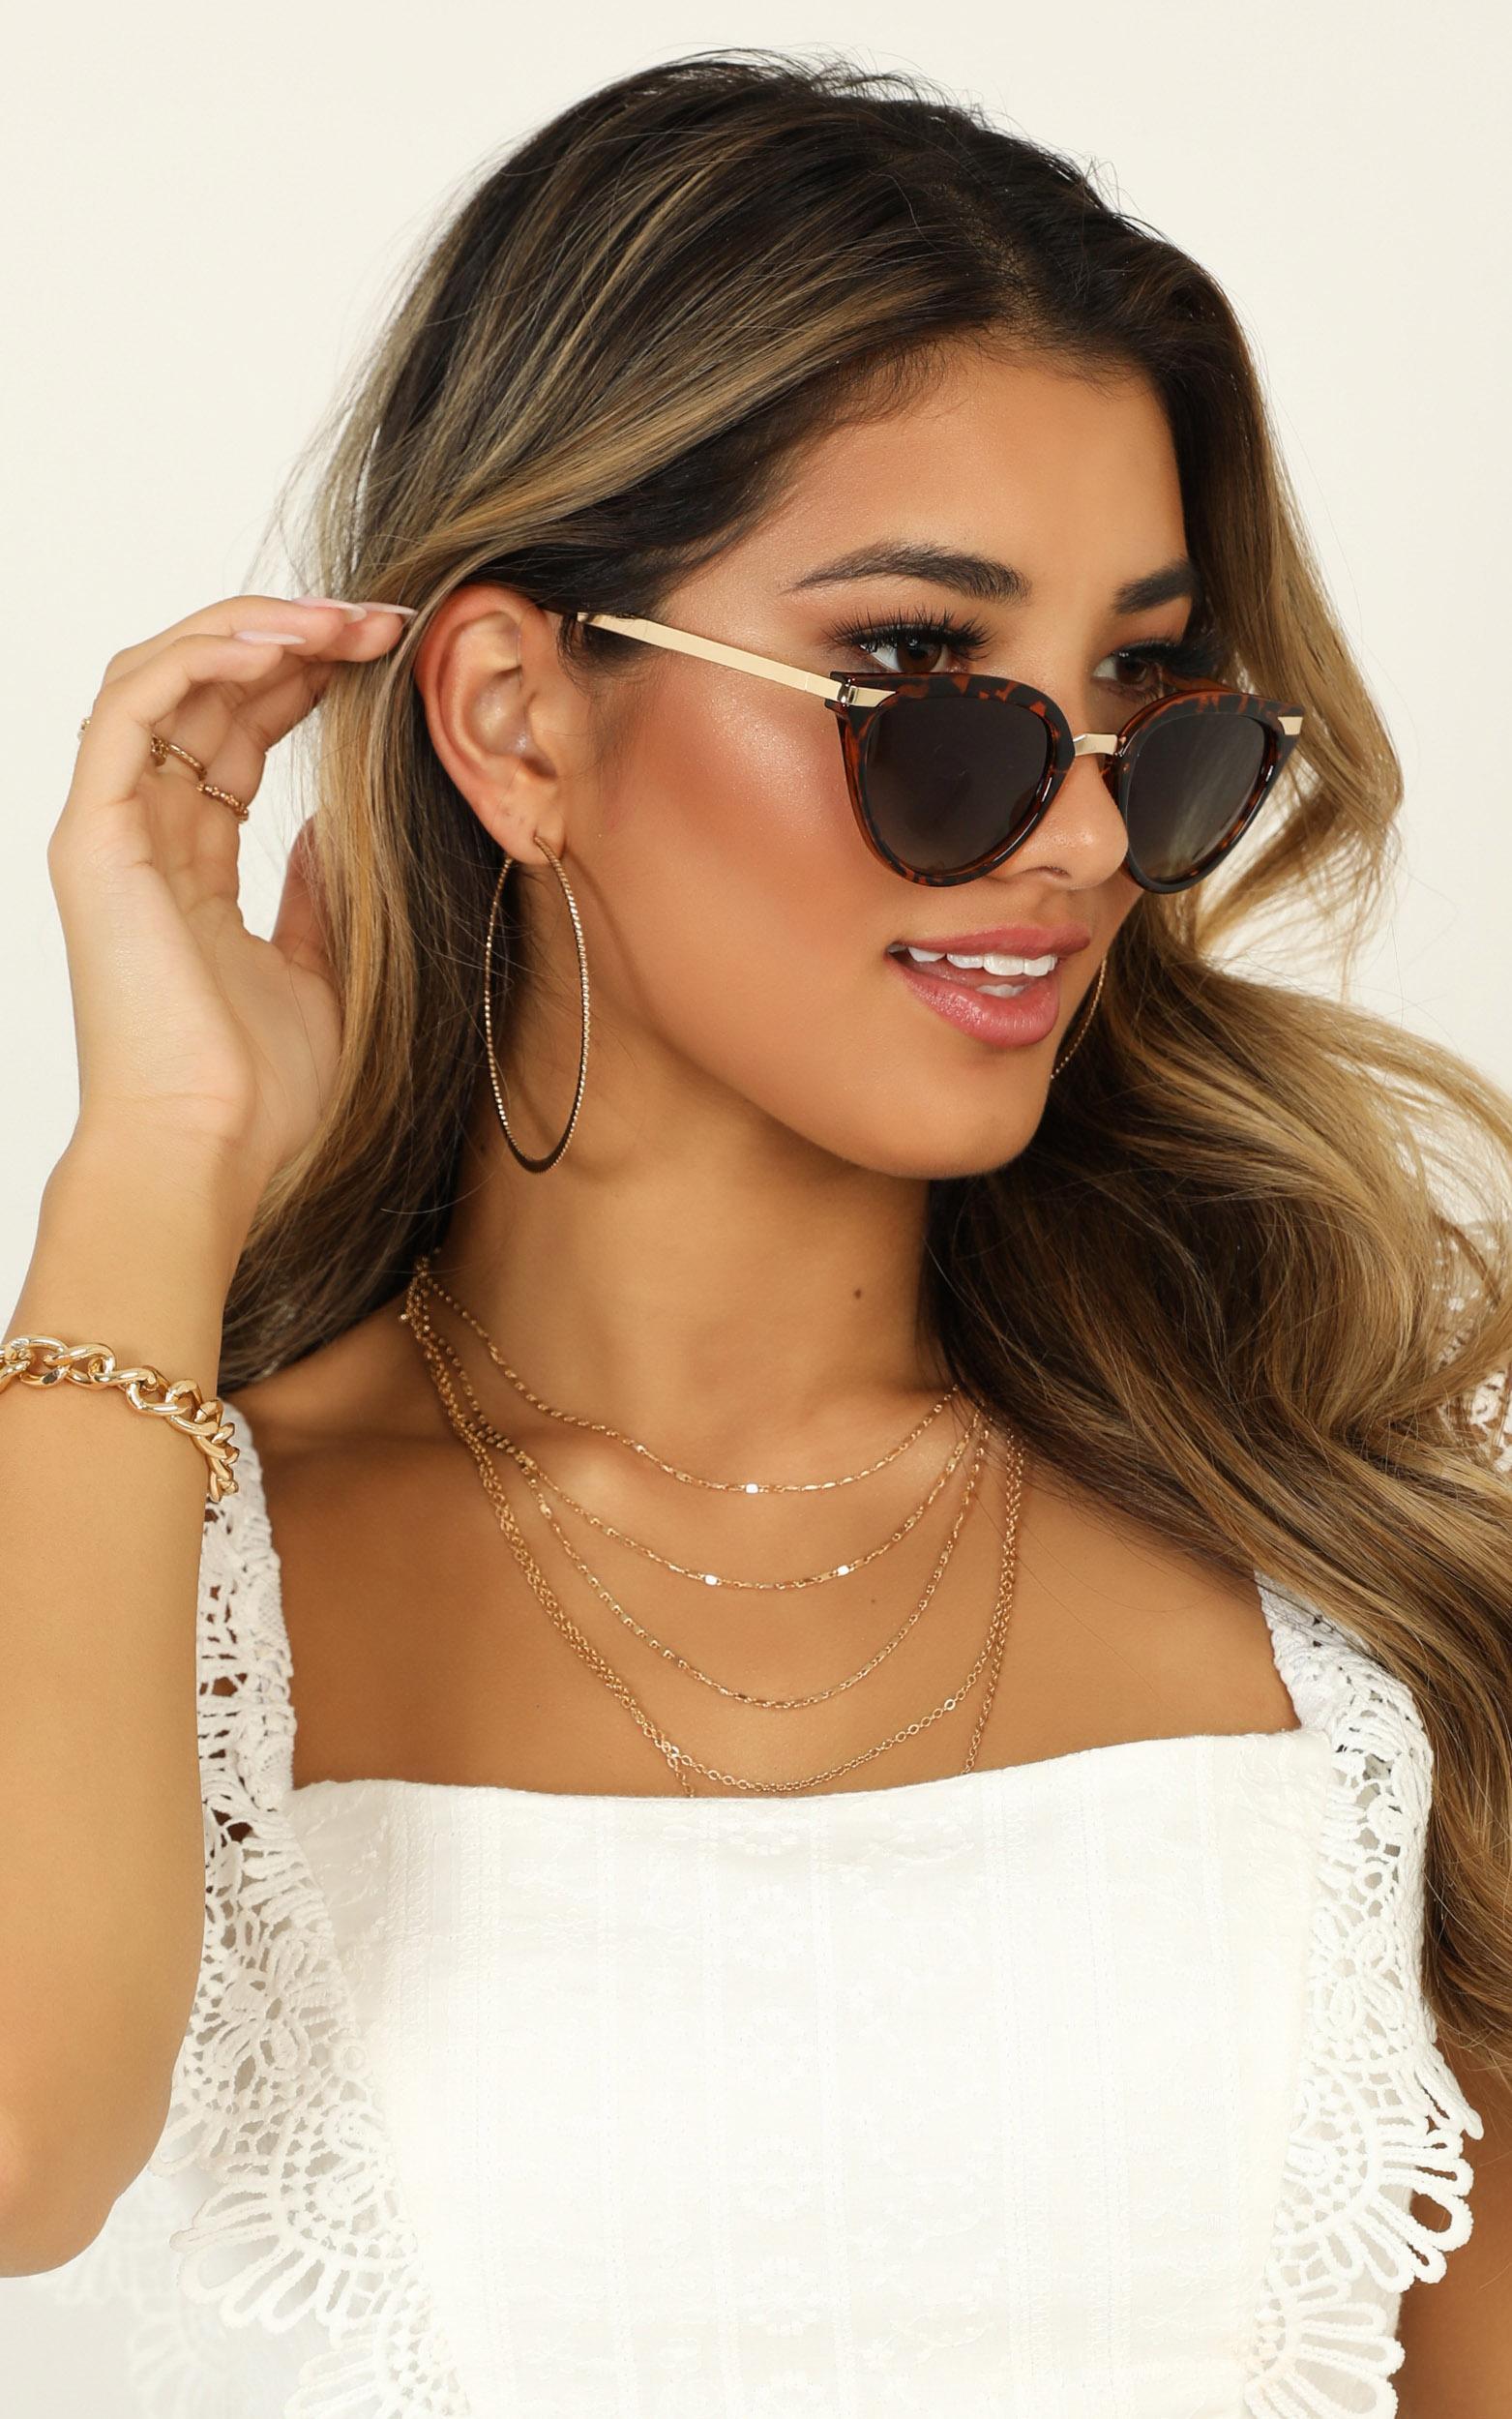 MinkPink - Getaway Sunglasses In Tort, , hi-res image number null